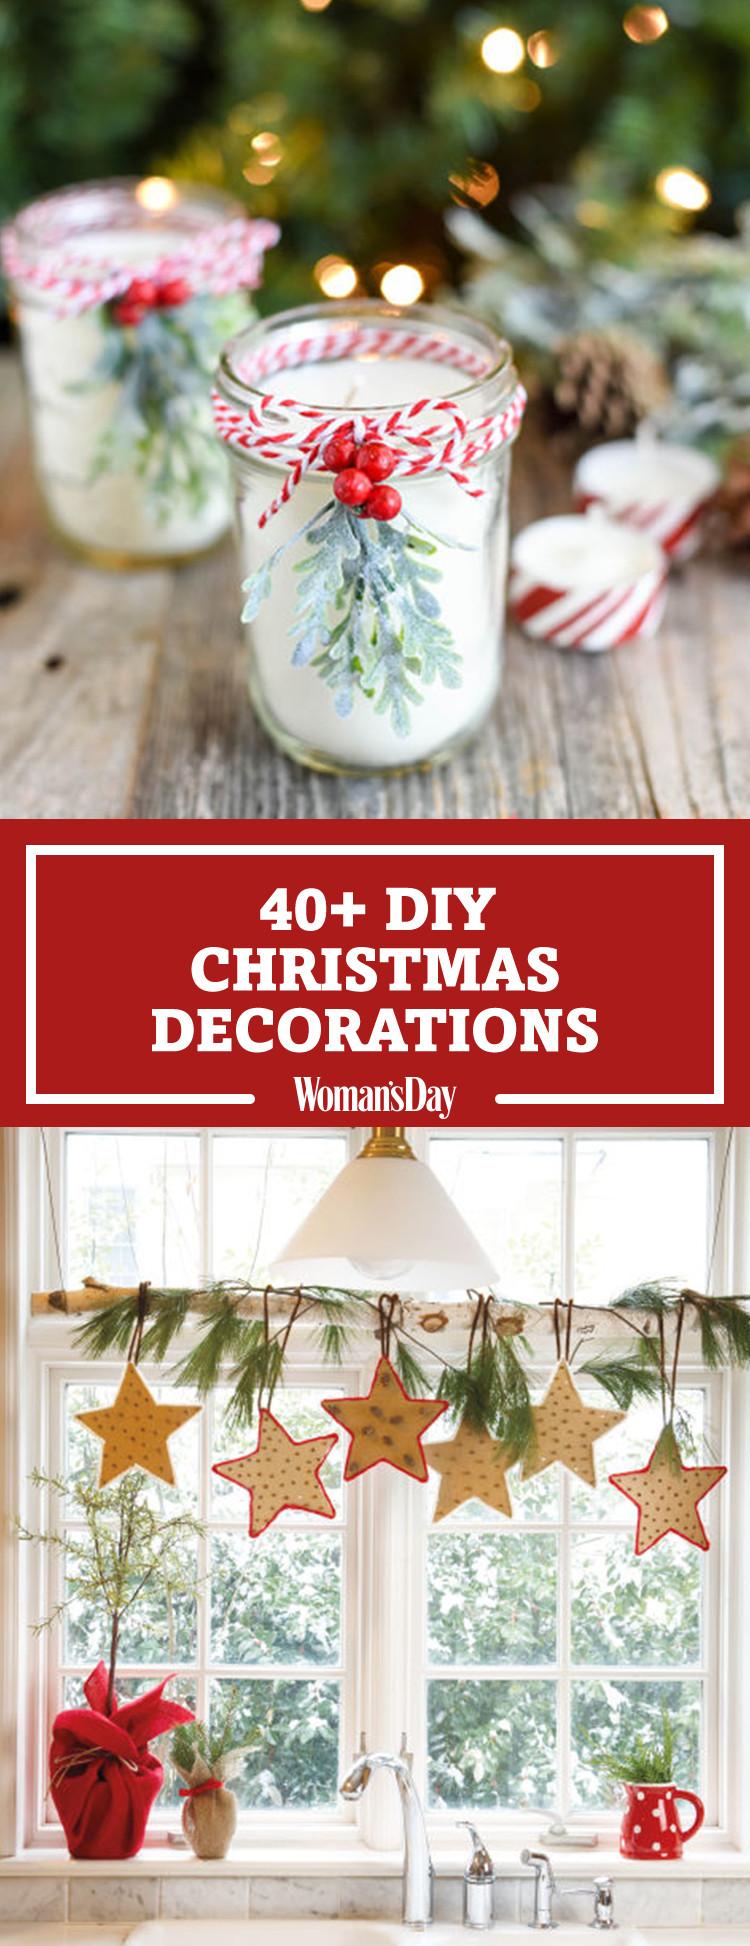 DIY Christmas Decorations  47 Easy DIY Christmas Decorations Homemade Ideas for